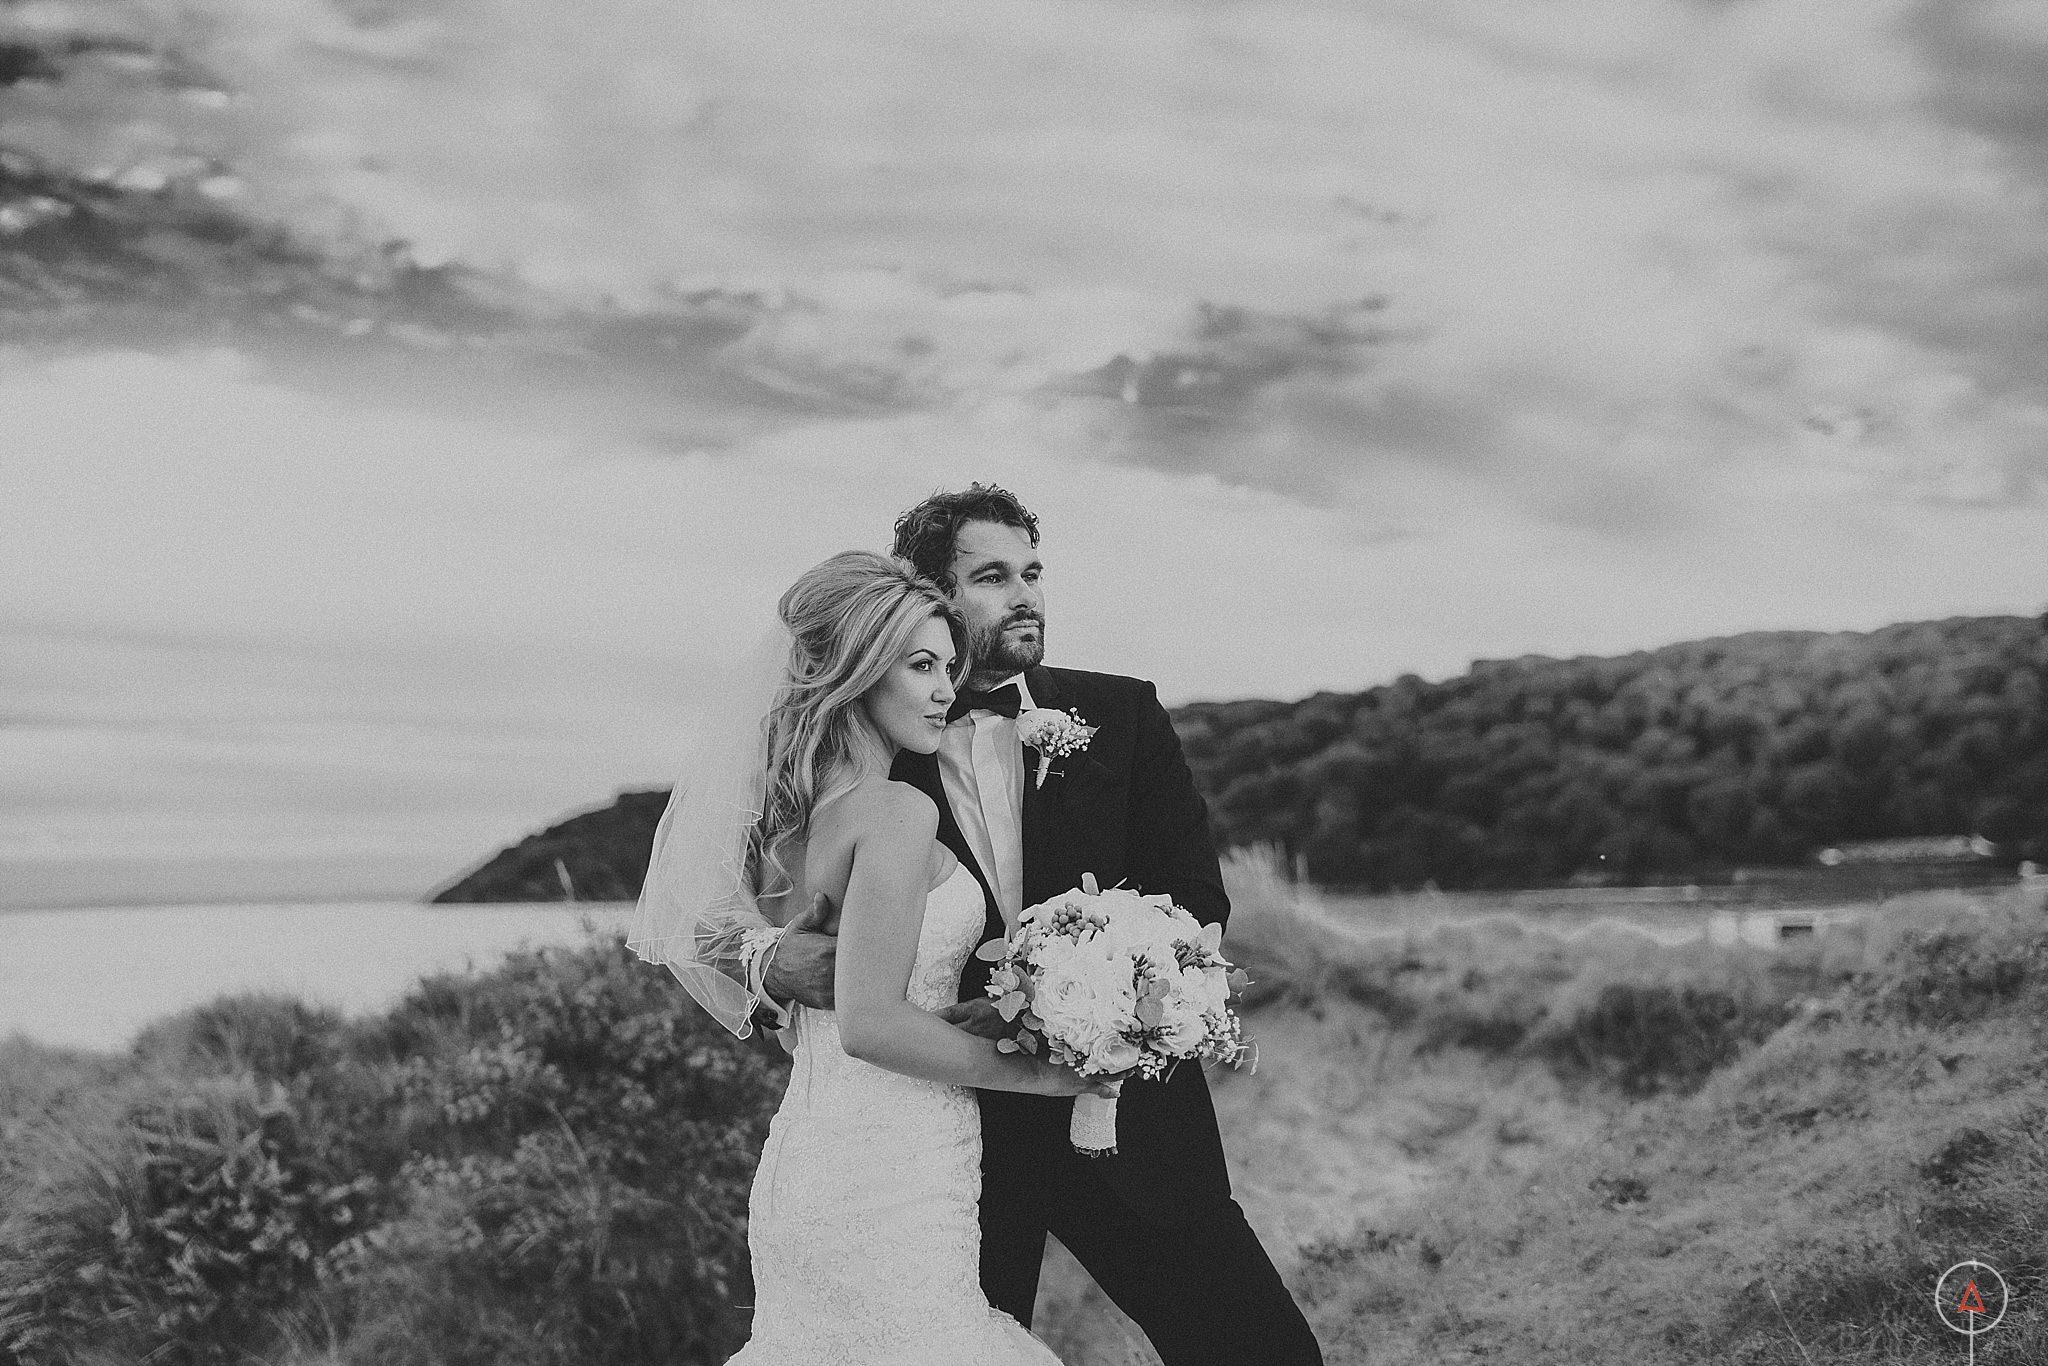 cardiff-wedding-photographer-aga-tomaszek_0411